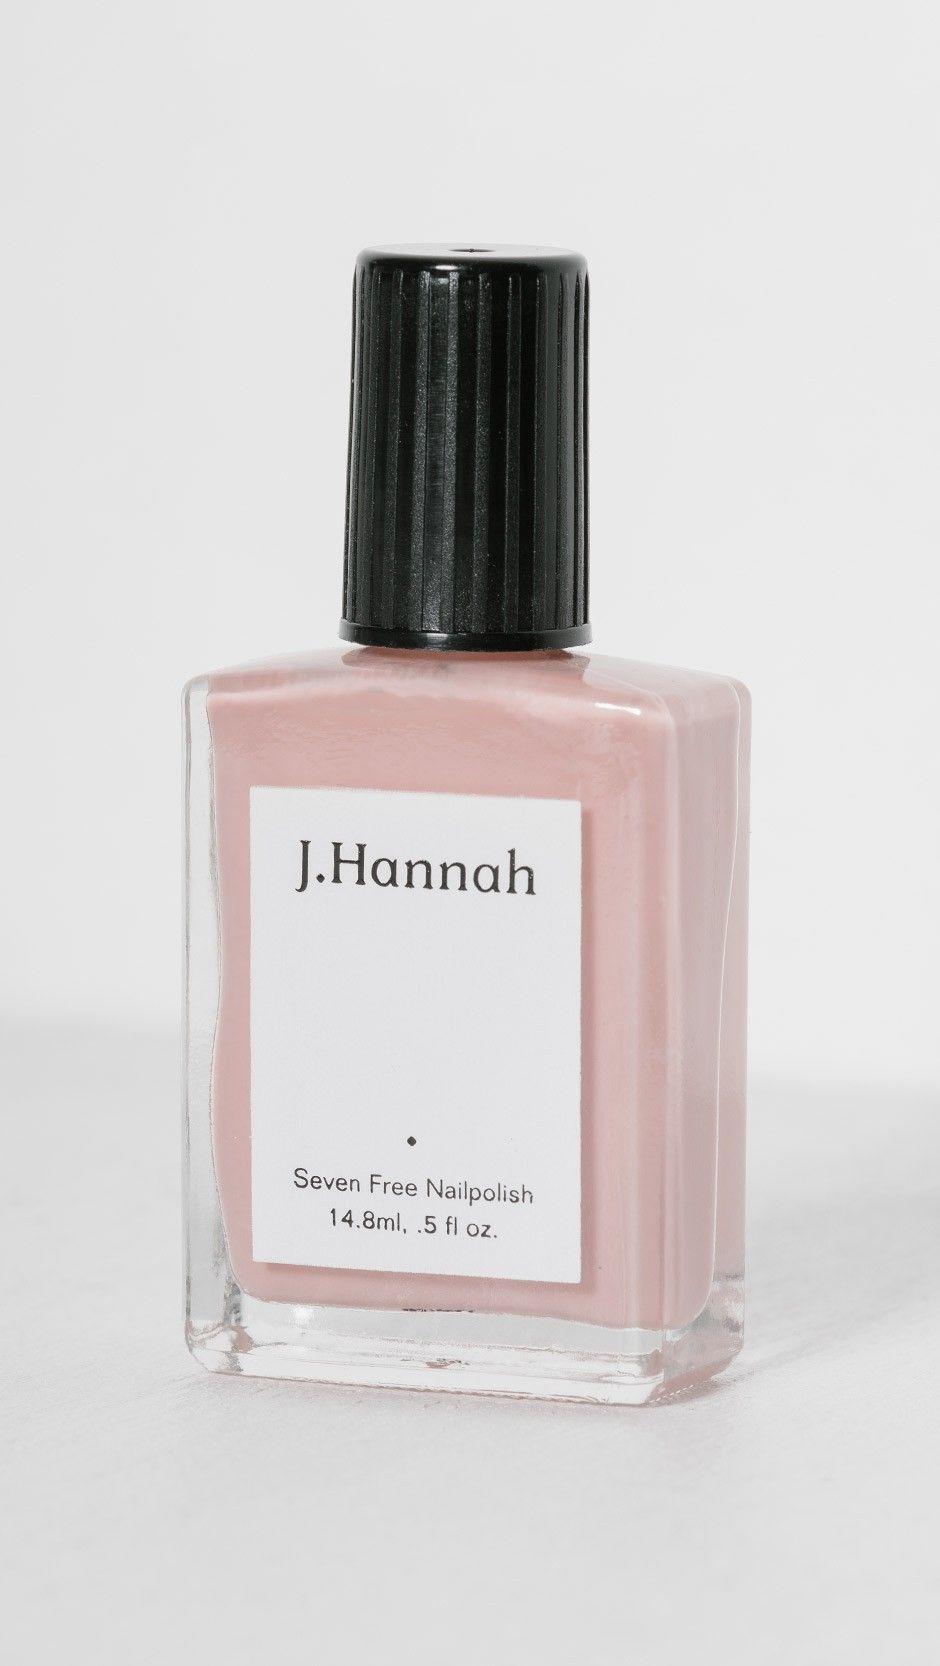 J Hannah Himalayan Salt Nail Polish in Himalayan Salt | The Dreslyn ...